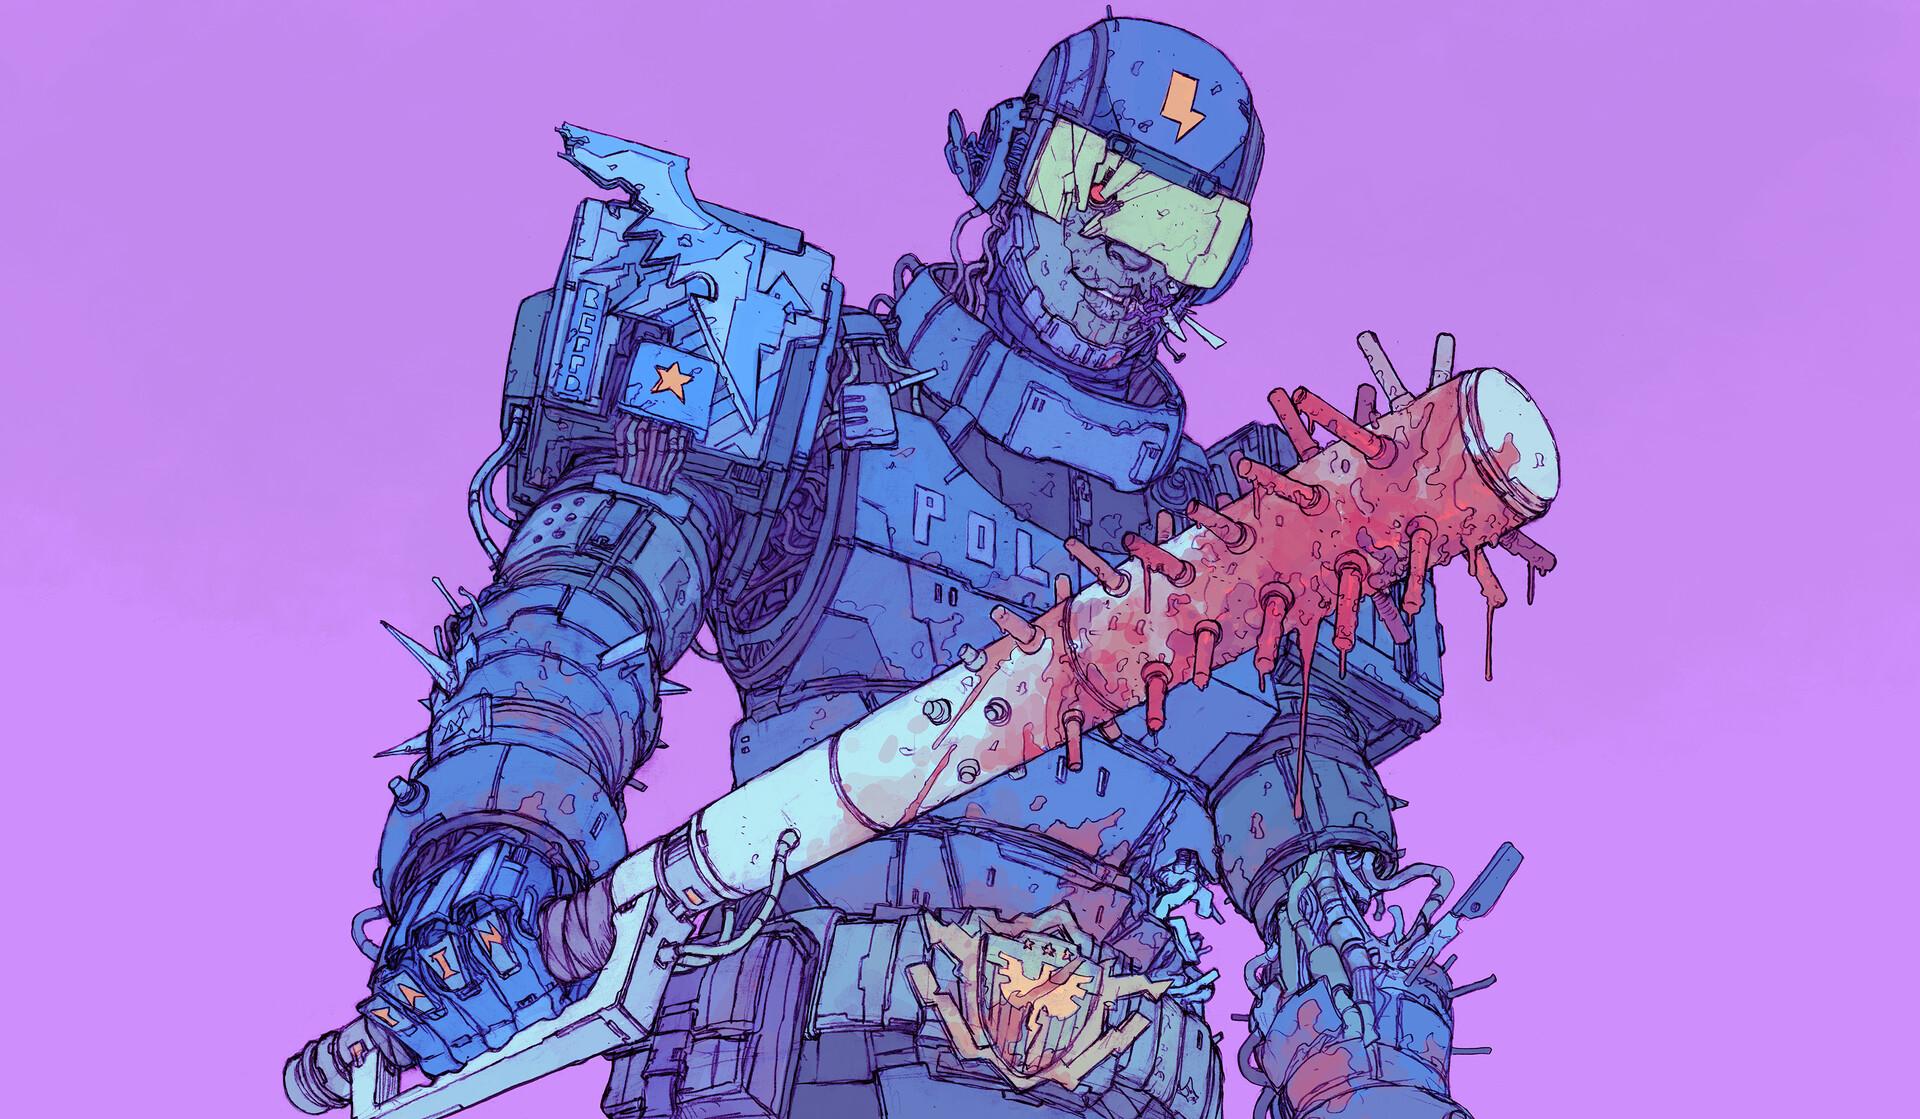 death-burger-zombie-pain-v13.jpg - Cyberpunk 2077